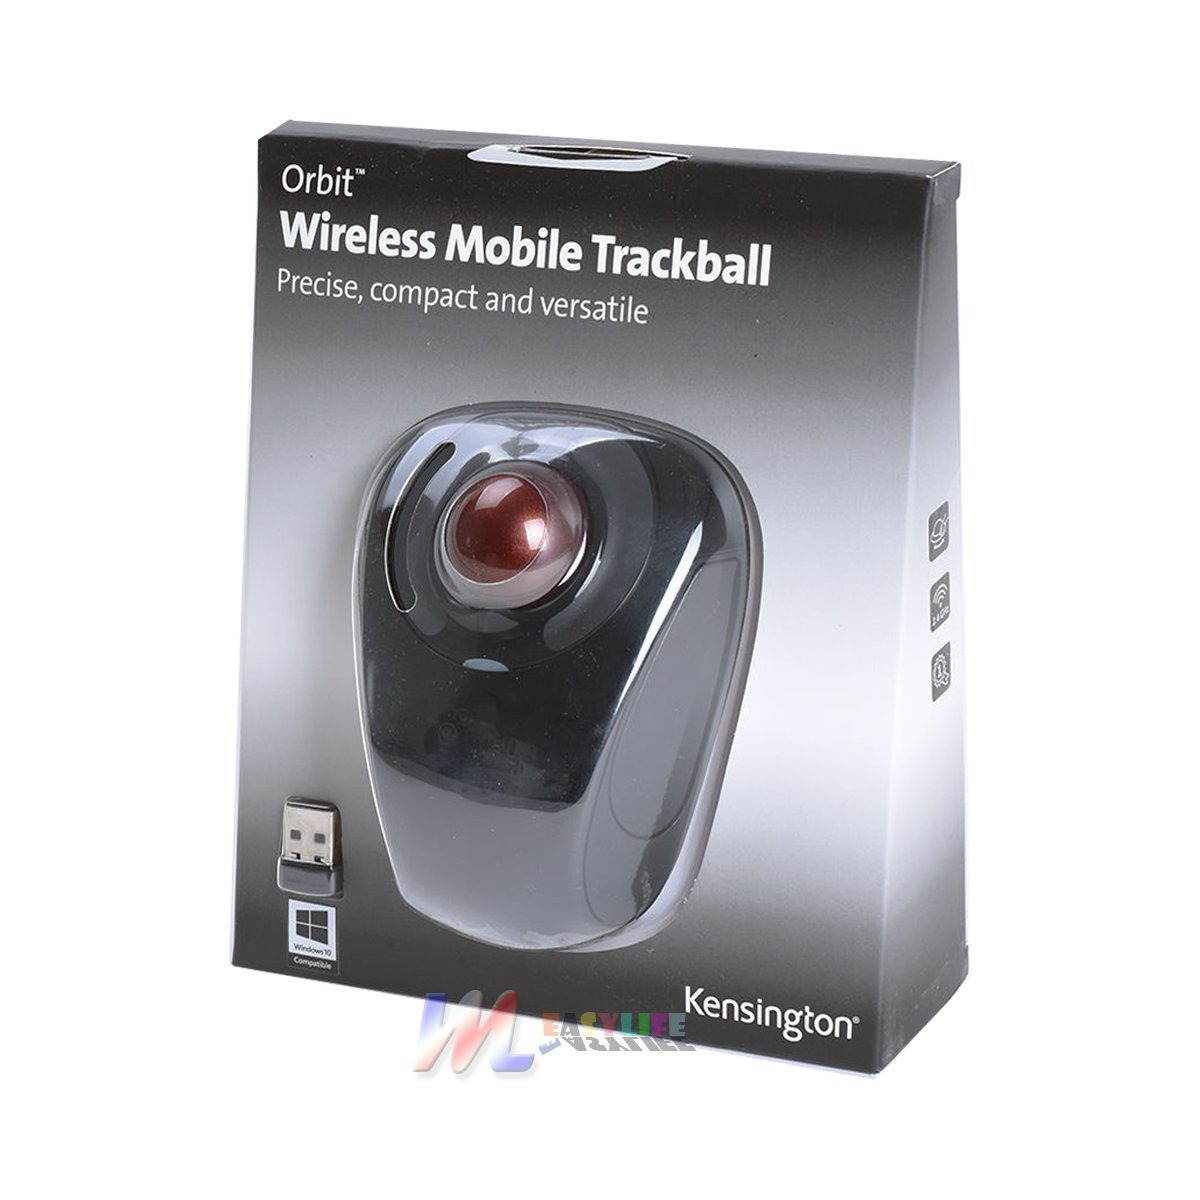 Orbit Wireless Mobile Trackball K72352US Windows 10 Compatible